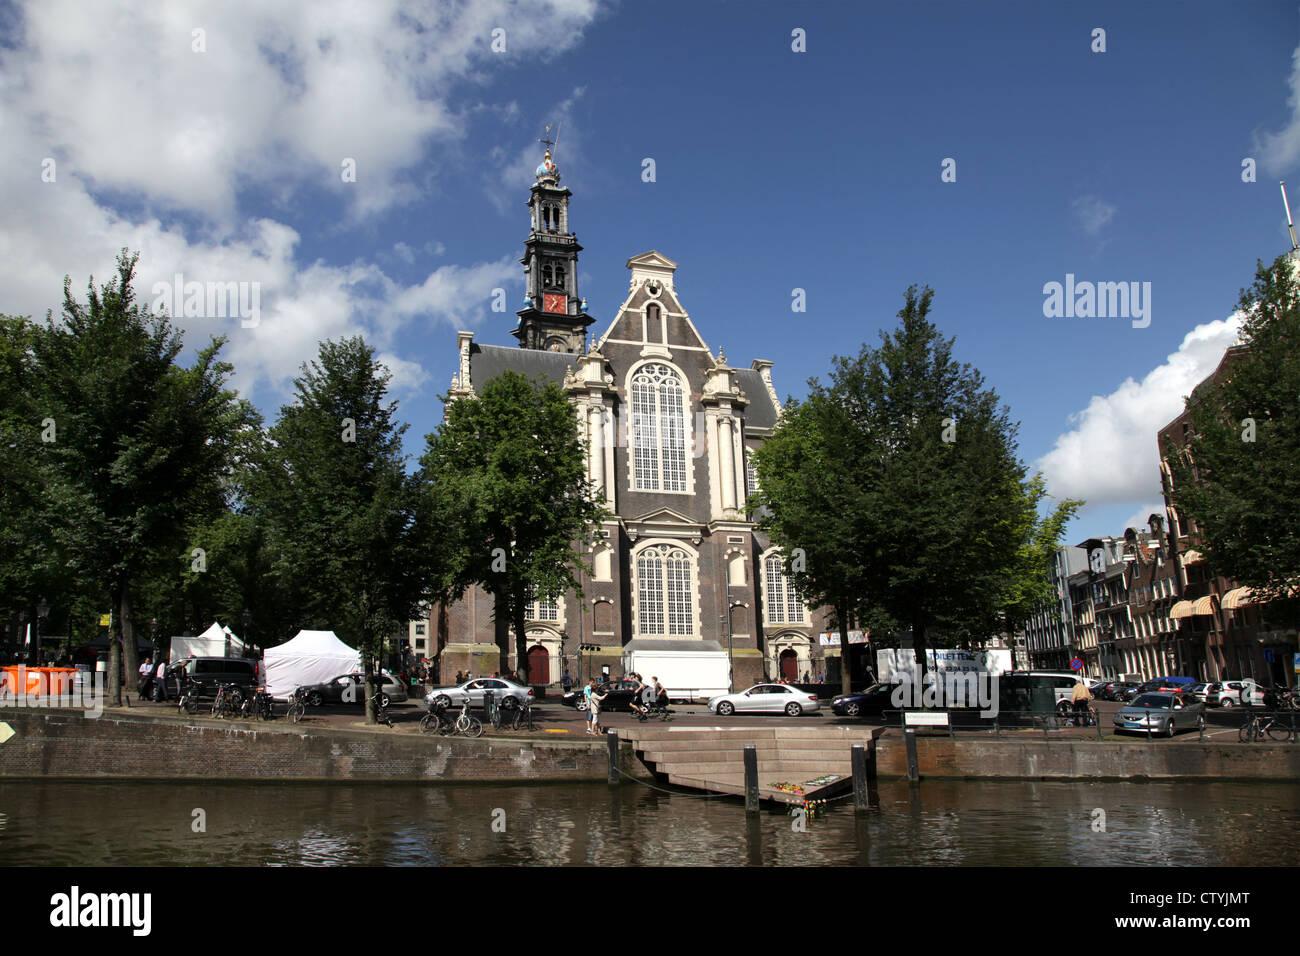 Amsterdam.Wester church.Westerkerk.canals.Homomonument. - Stock Image